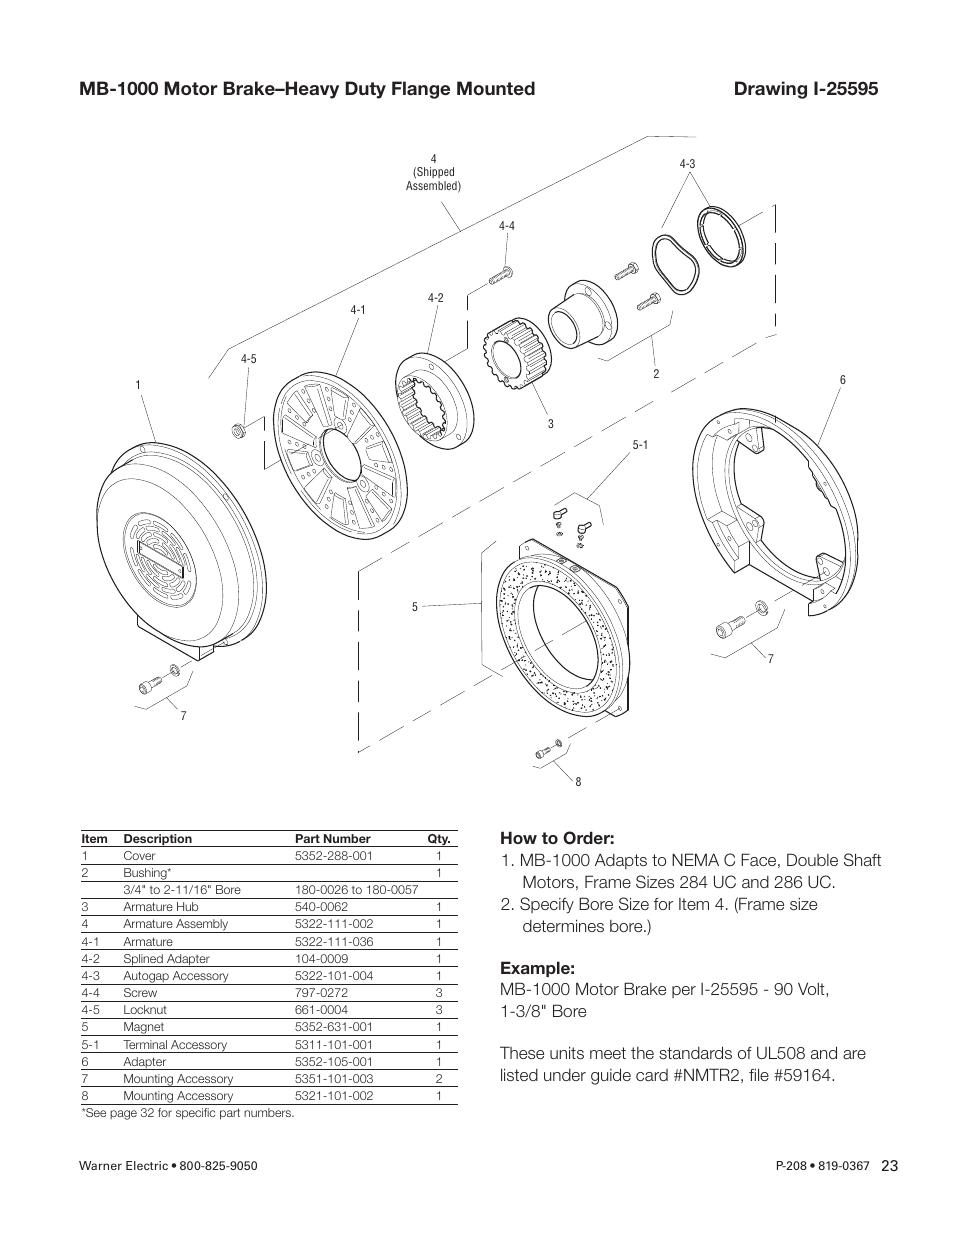 Warner Electric Primary Brake Pin Drive Armature Pb 825 1000 Mb Engine Diagram 1225 1525 Motor And Spline User